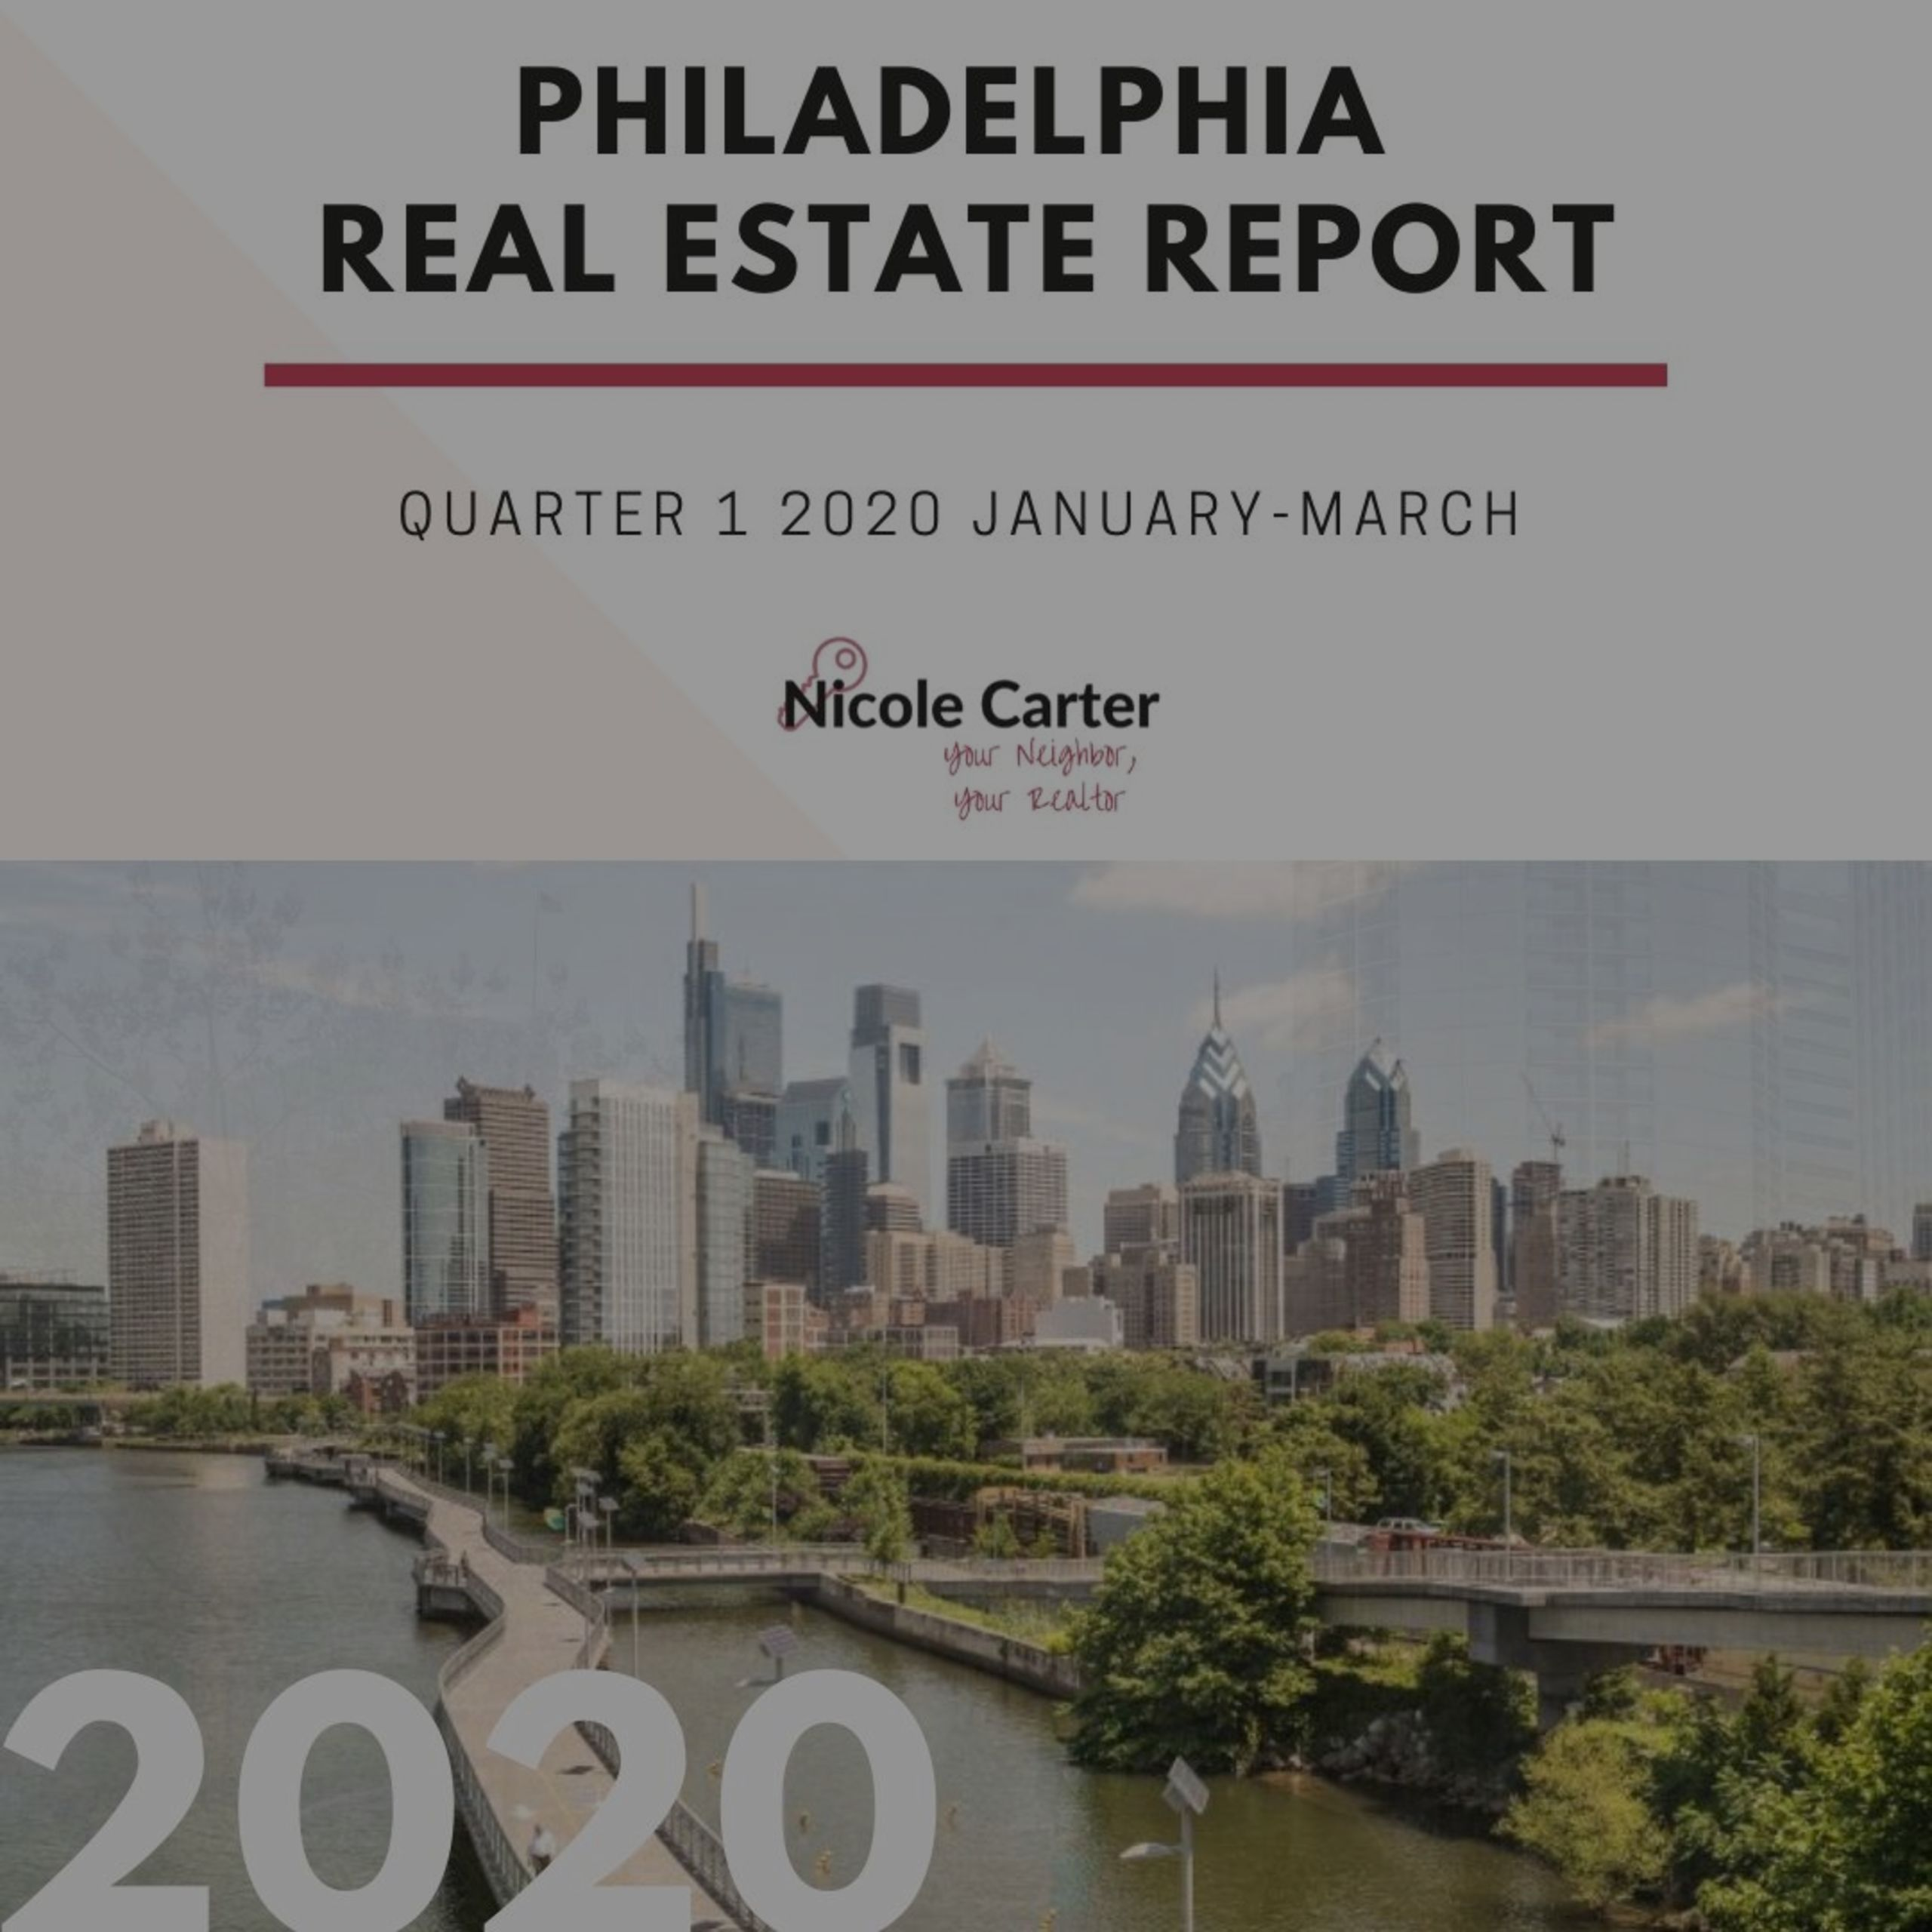 PHILADELPHIA REAL ESTATE REPORT QUARTER 1 JANUARY -MARCH